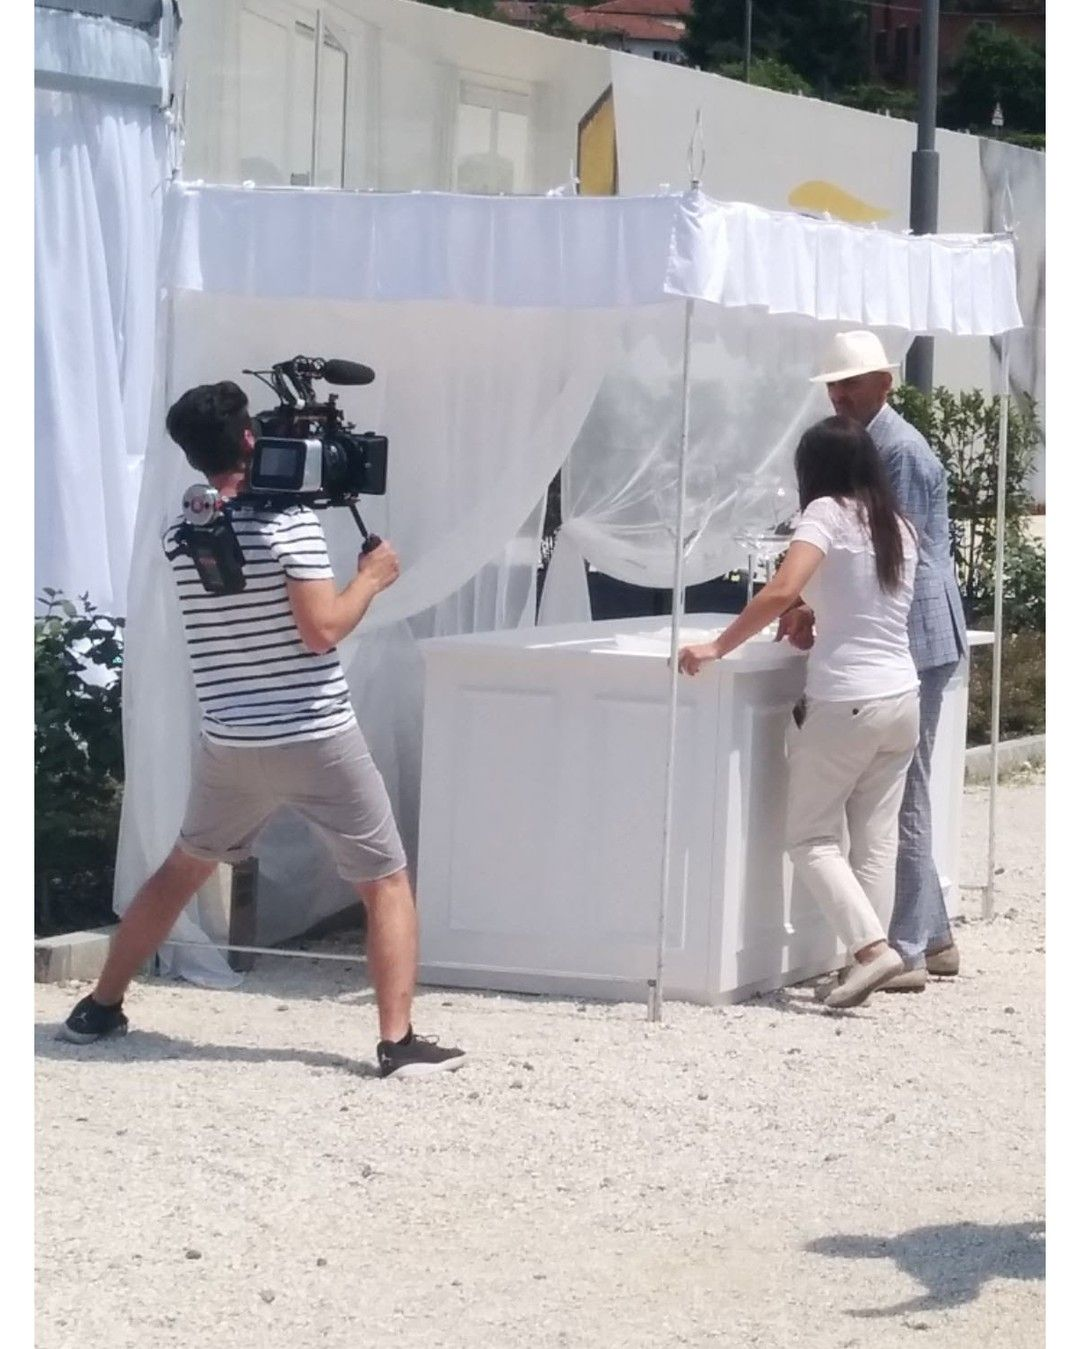 Foto dal set di #DiarioDiUnWeddingPlannerII. #jumpcutmedia #videoproduction #videogear #video #filmmaking #filming #setlife #onset #filmlife #rec #videocamera #moviecamera #videomaker #videomaking #lens #cameralens #camerasetup #promo #promoTV #TVShow #spot #spotTV #commercial #EnzoMiccio #EnzoMiccioBridalCollection #WeddingPlanner #DiarioDiUnWeddingPlanner #RealTimeItalia #DiscoveryItalia